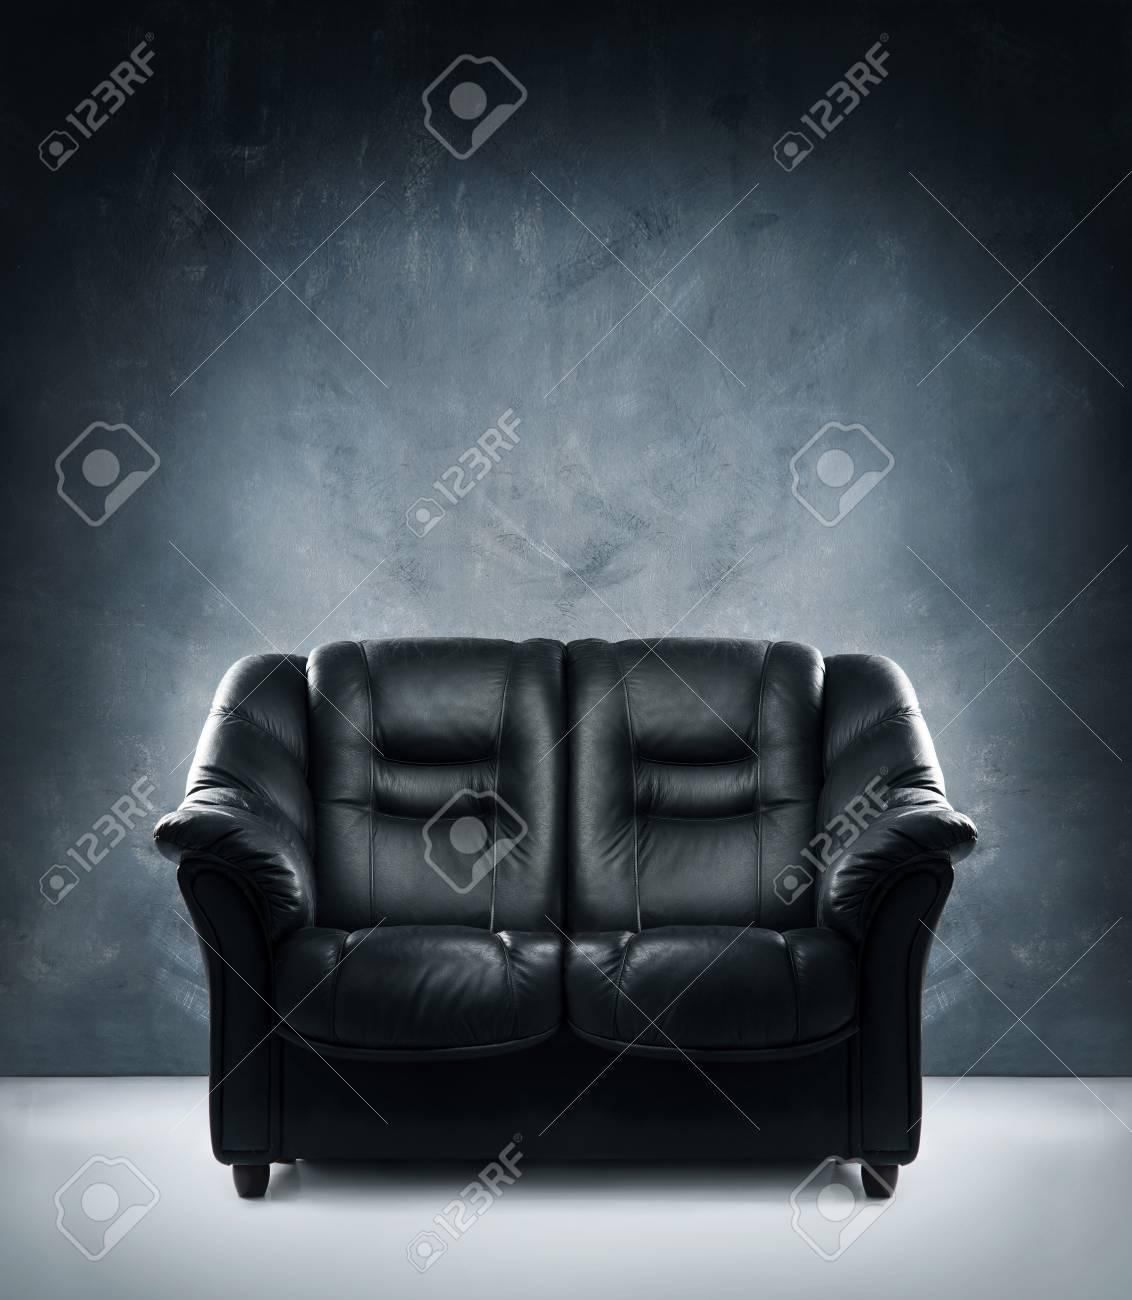 7b0afa2b426 Black leather sofa in dramatic interior Stock Photo - 44633531